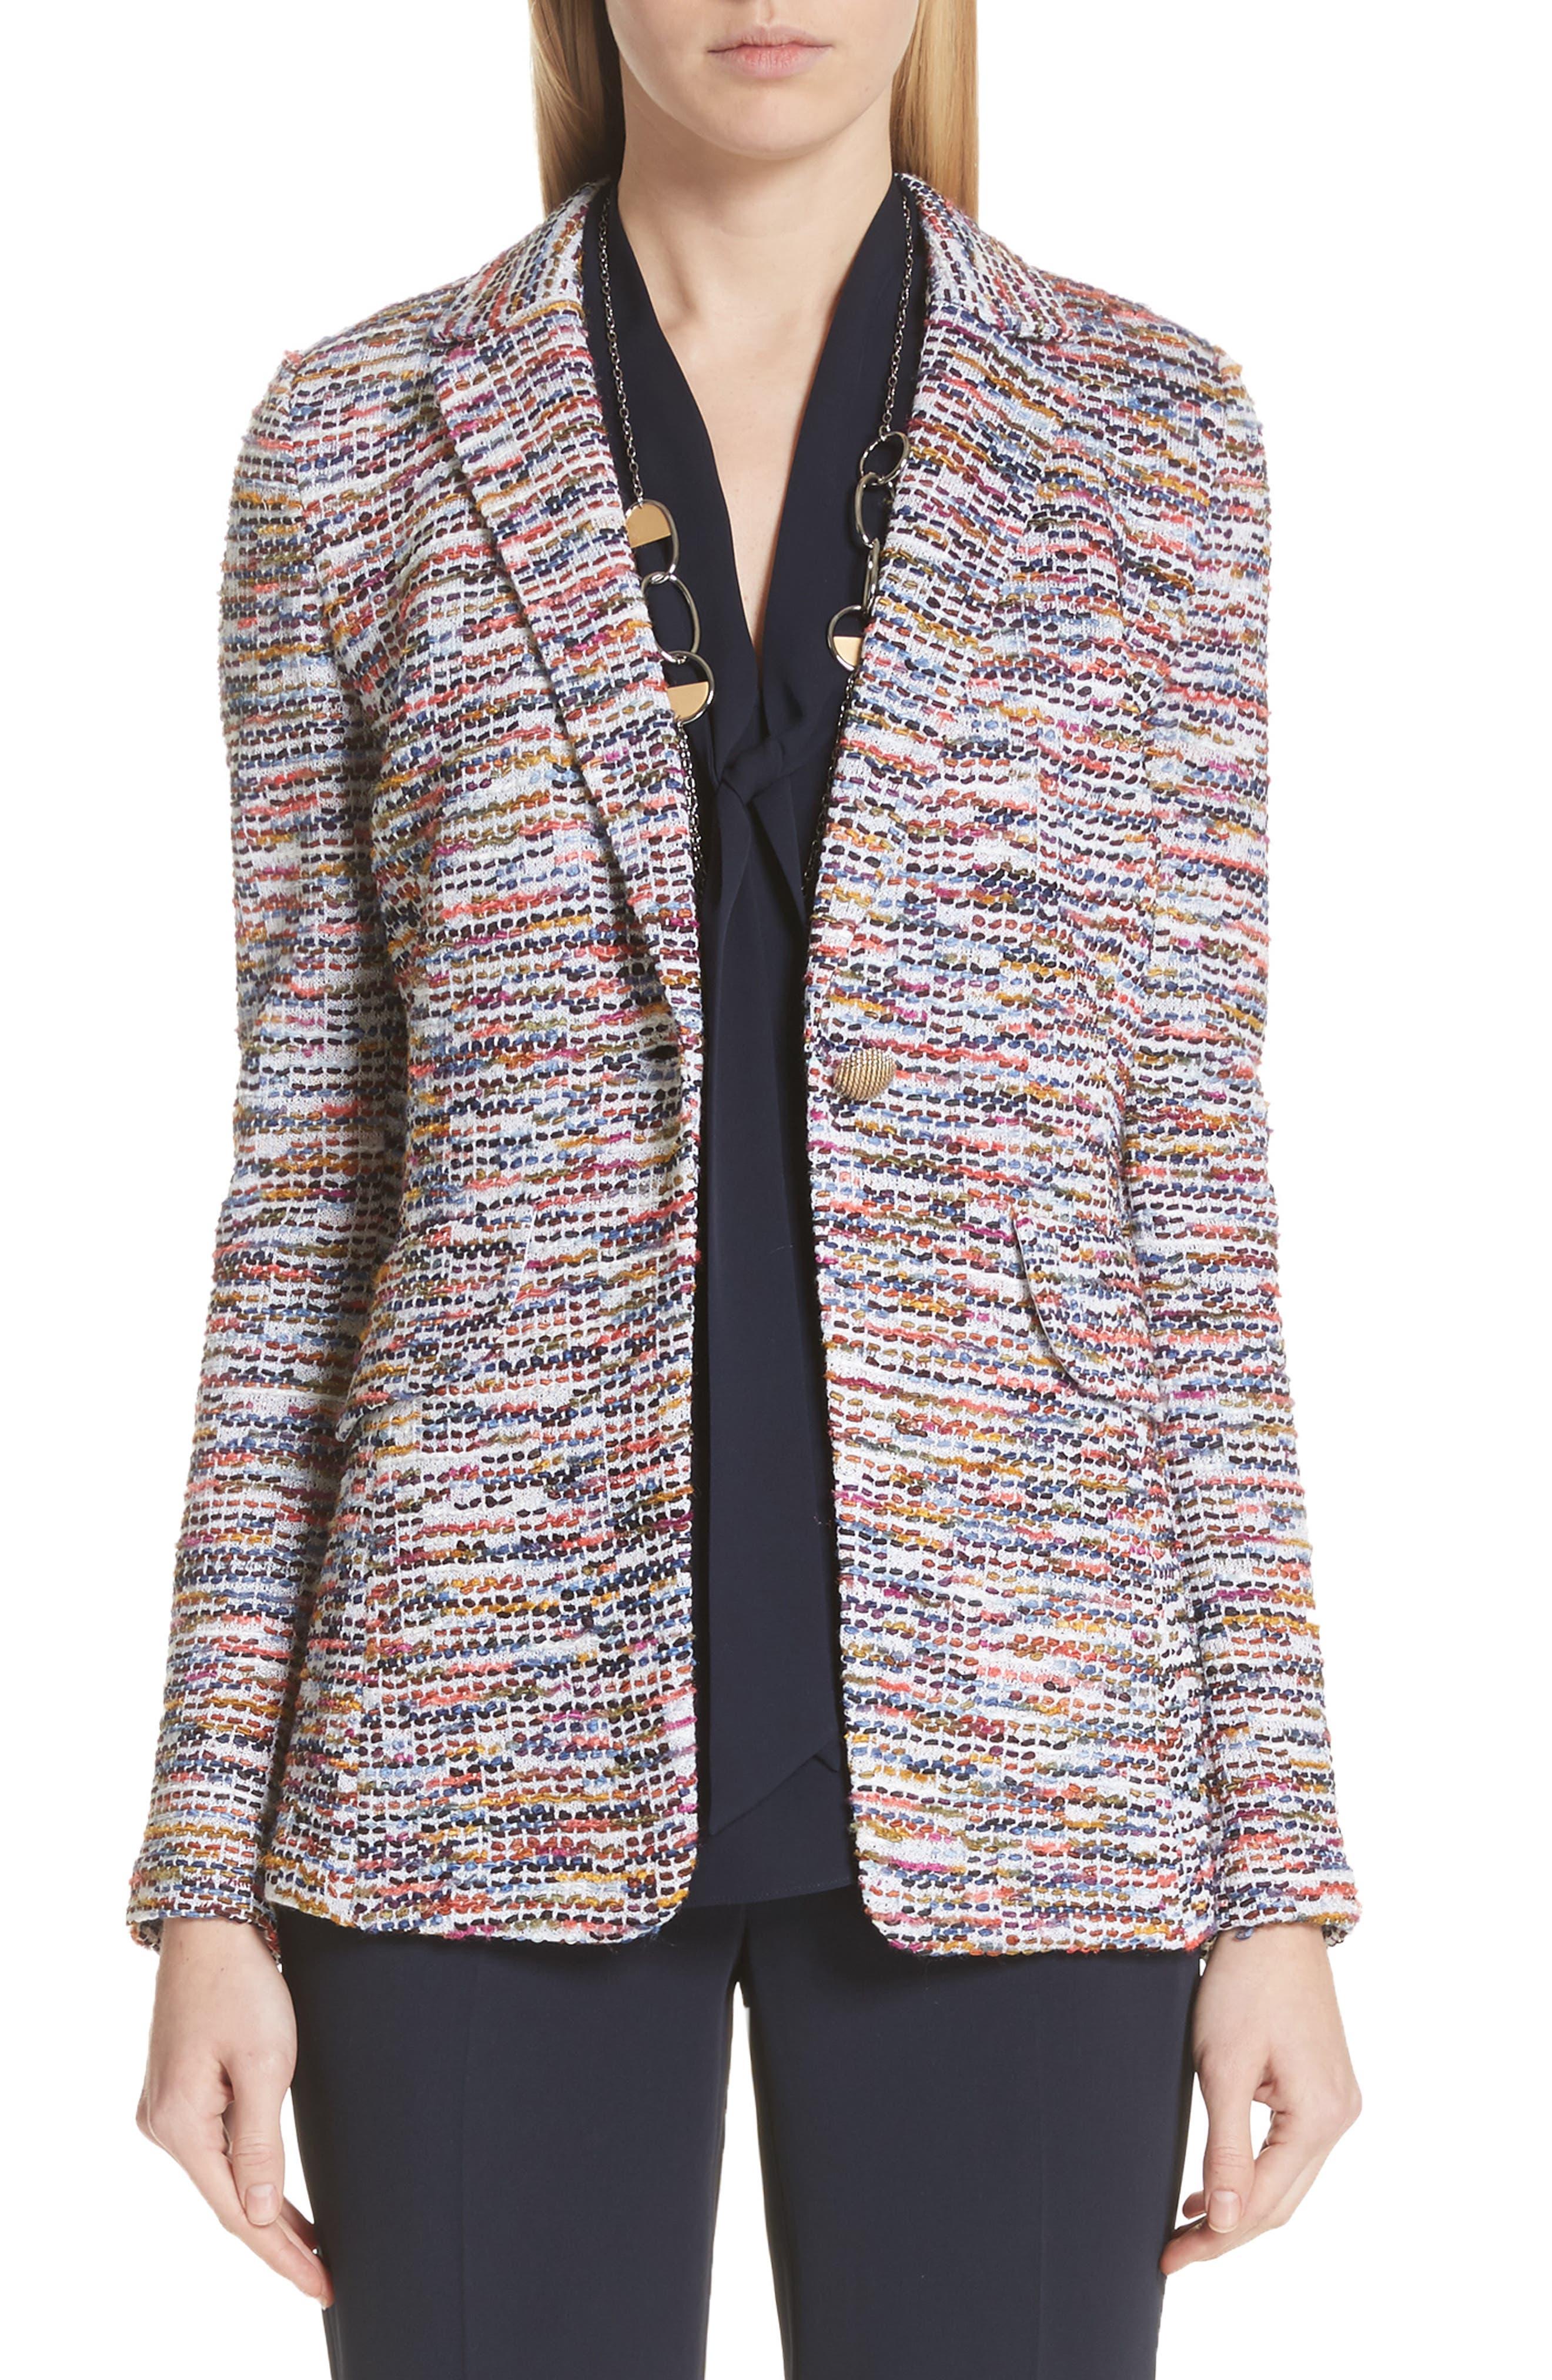 Vertical Fringe Multi Tweed Knit Jacket,                             Main thumbnail 1, color,                             Sienna Multi